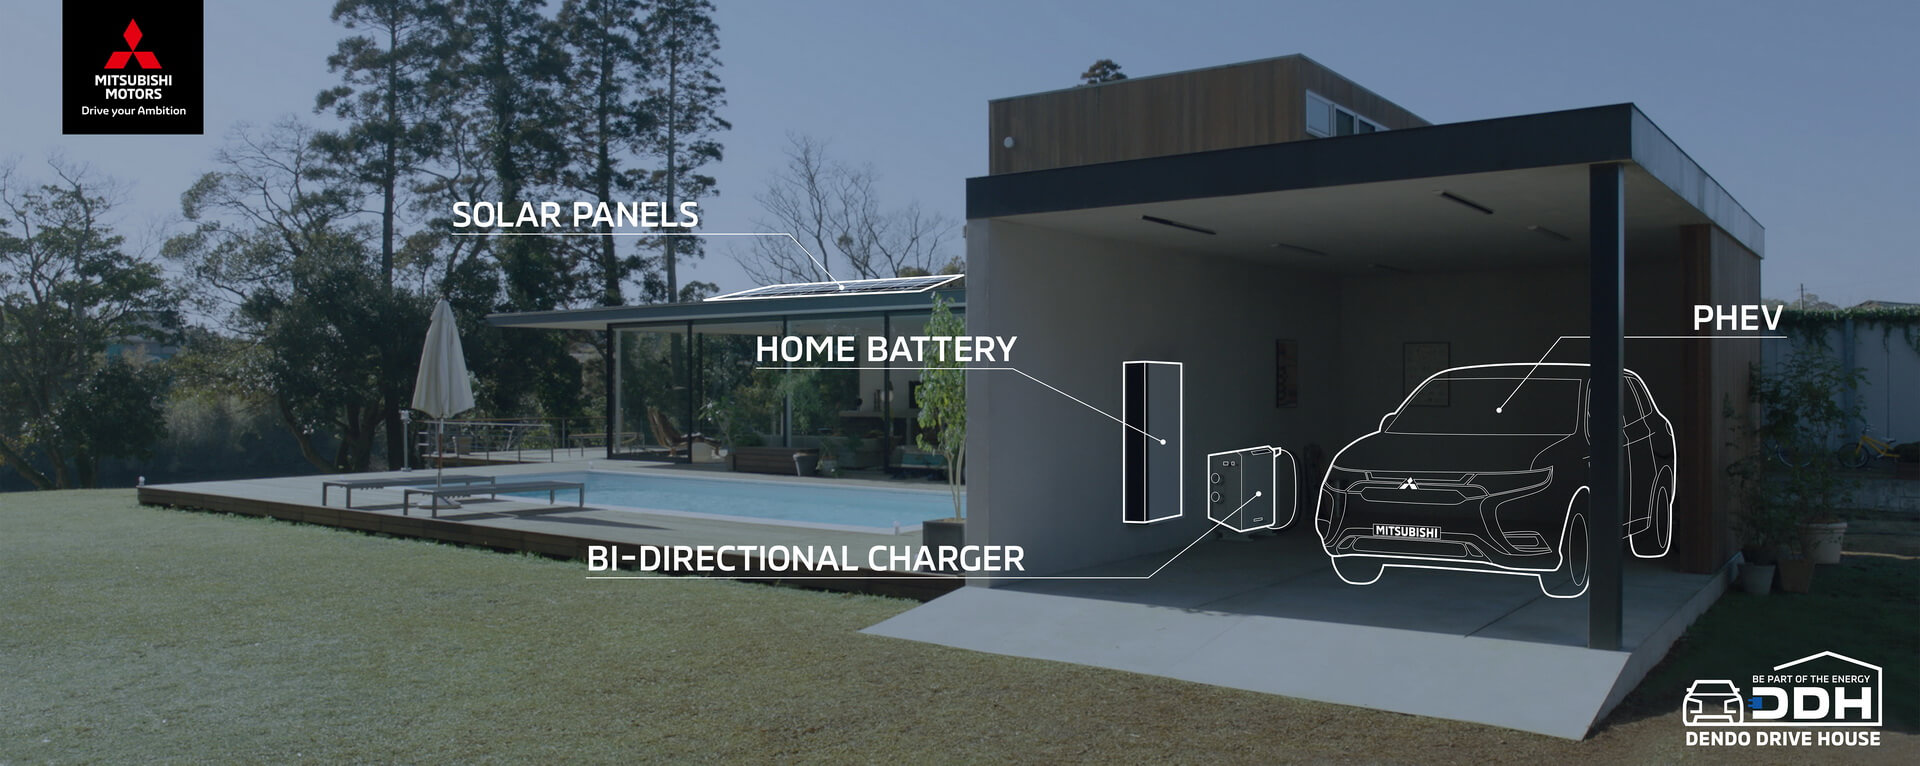 Mitsubishi Engelberg Tourer PHEV стехнологией DENDO Drive House